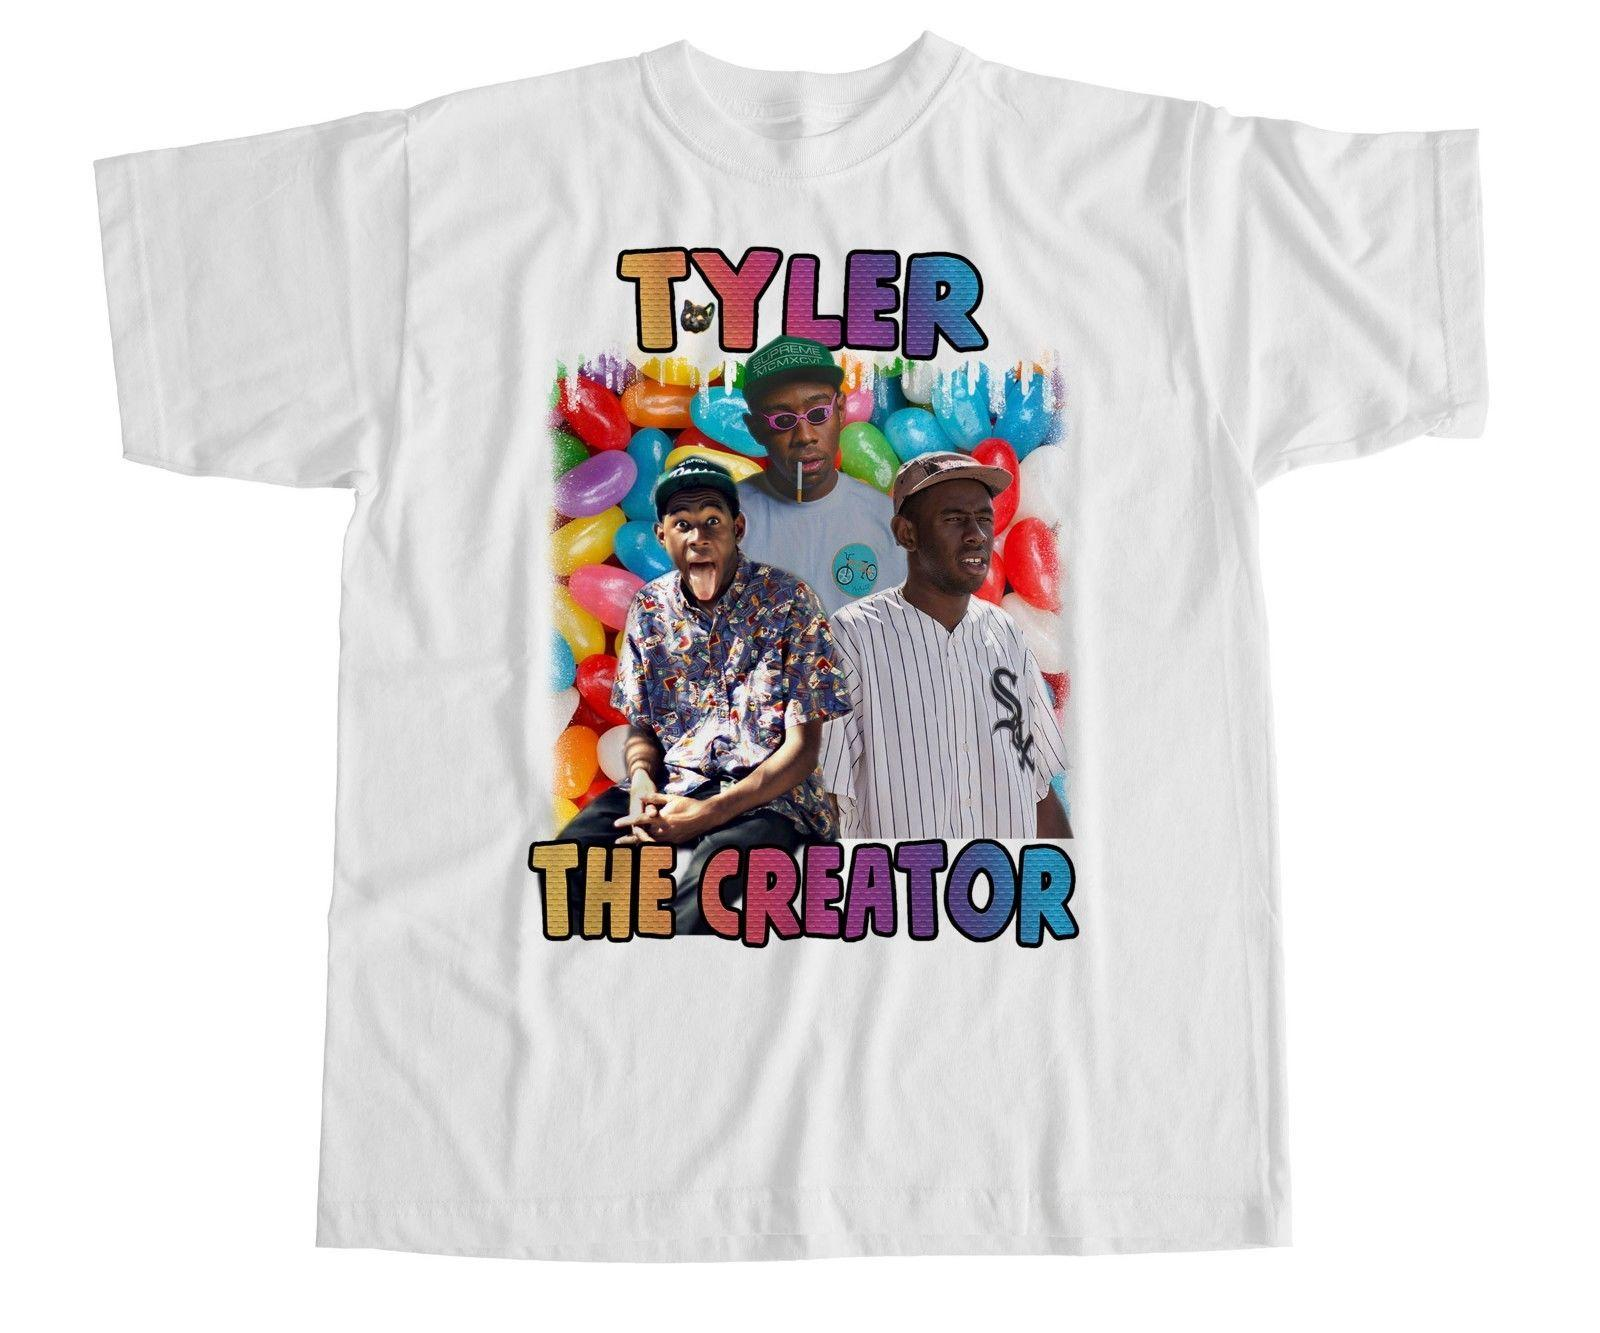 4182f6f6274a Tyler The Creator T Shirt Earl OFWGKTA Odd Future Cherry Bomb Wolf Gang New  T Shirt Designs Cool Shirts From Dhgategiff